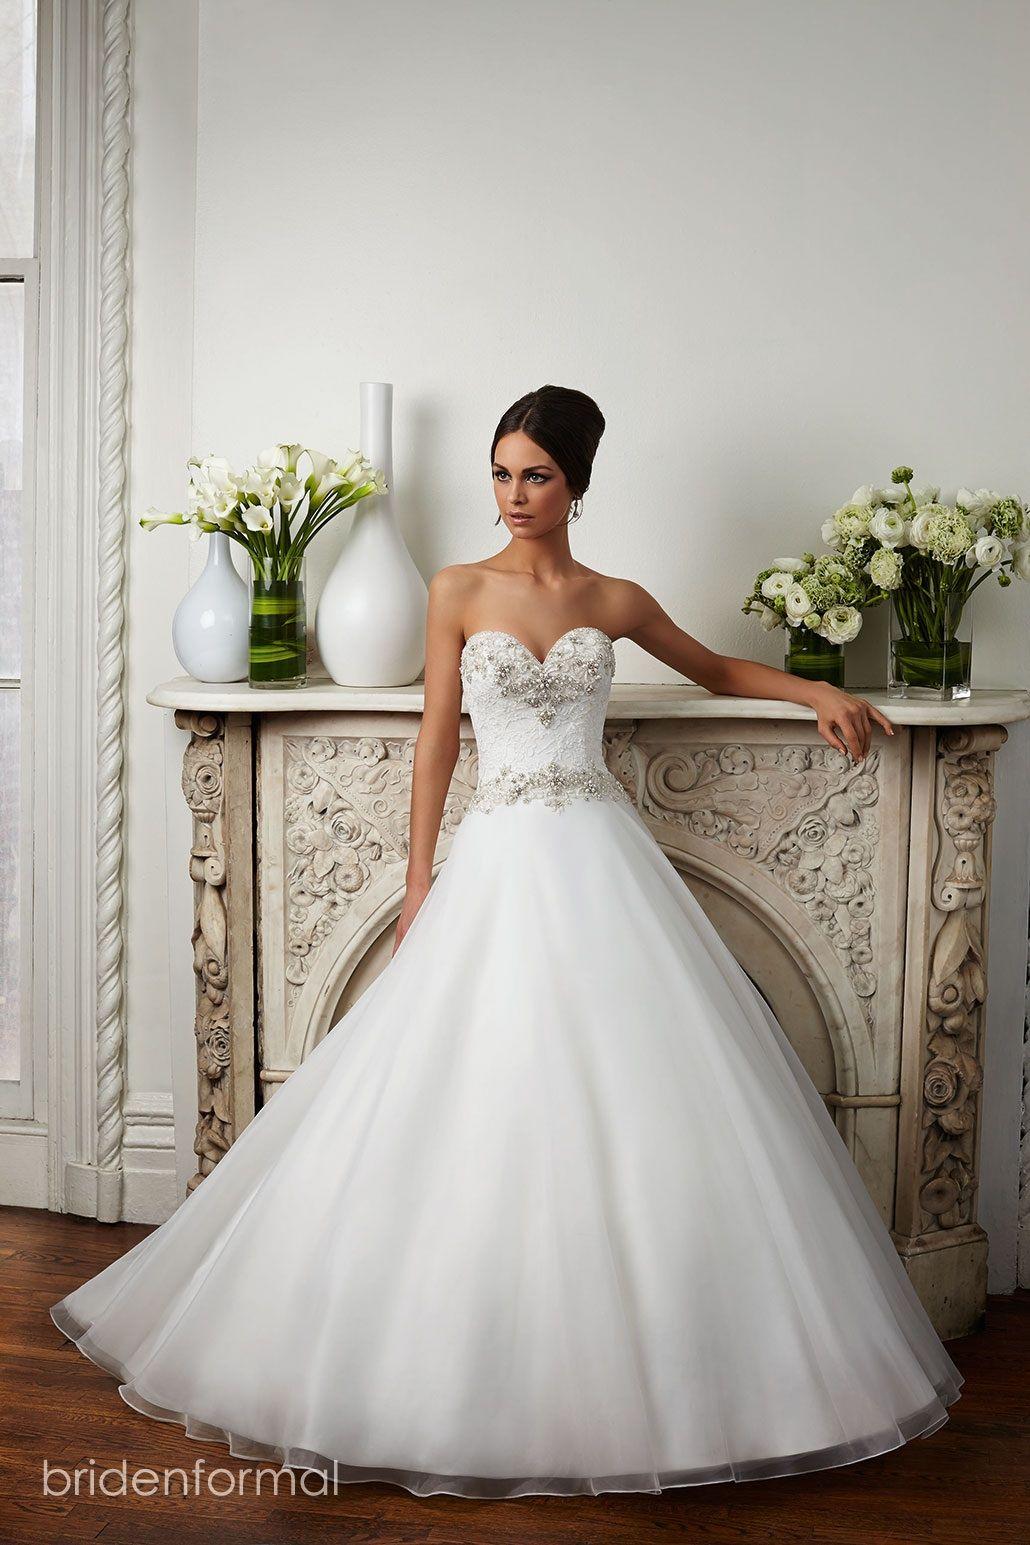 Natural wedding dresses  Pin by Lisa on WEDDINGS in   Pinterest  Wedding dresses